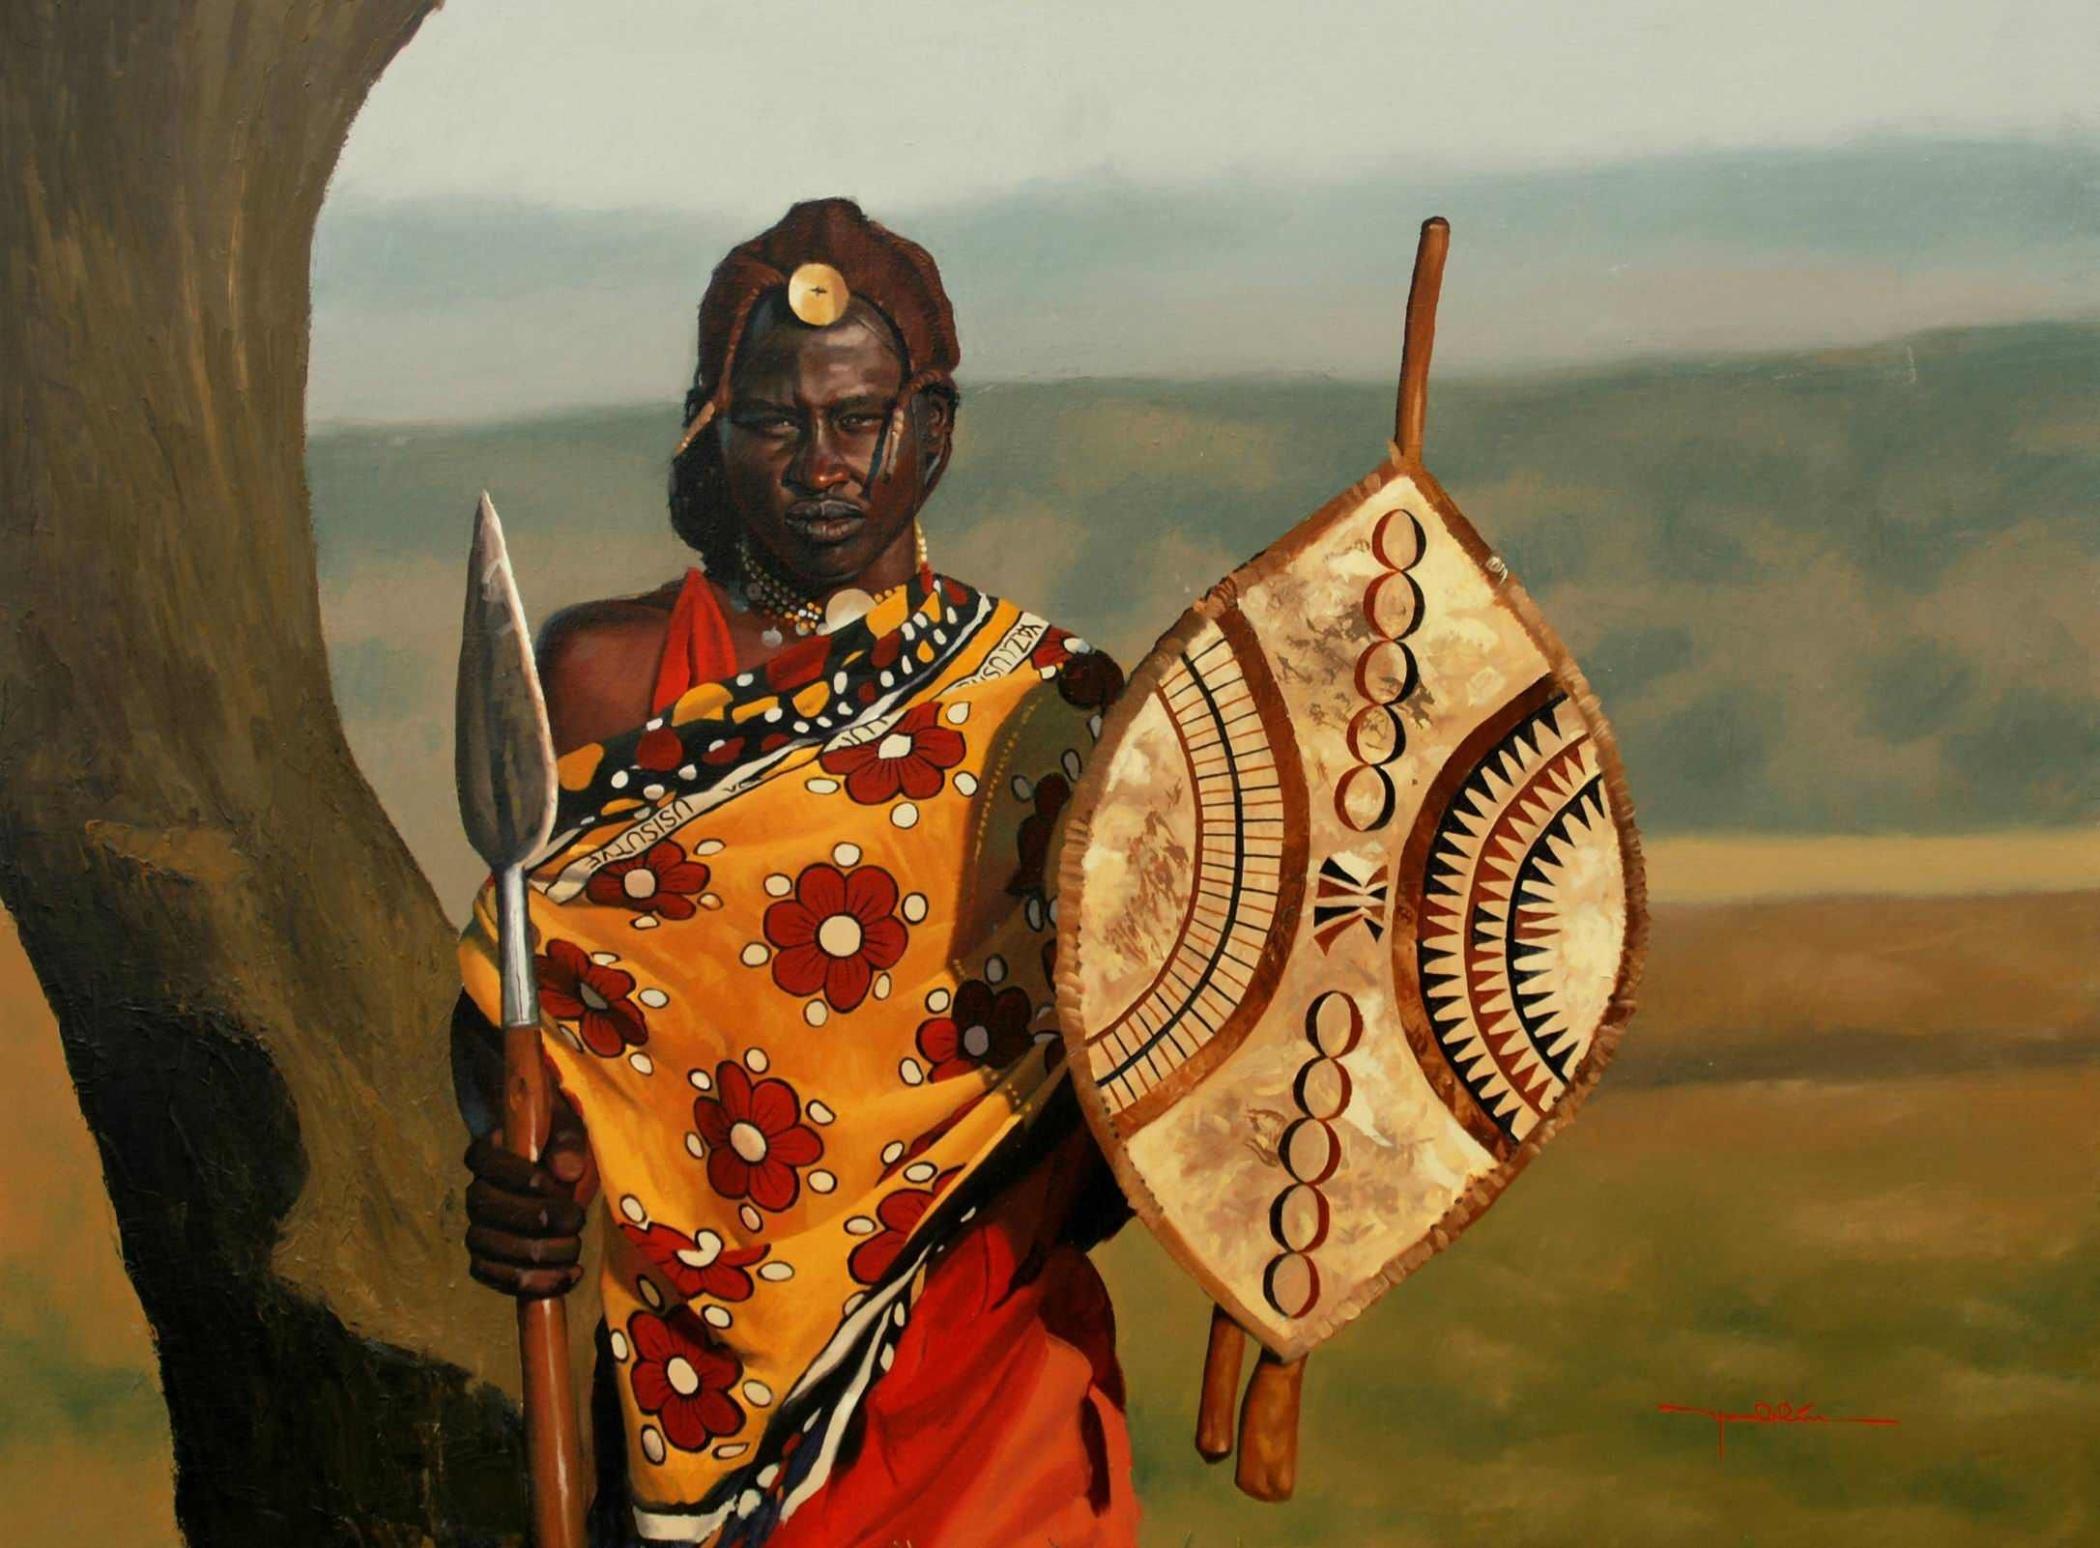 ob_e107e0_matthewo-13-7-2009-10-29-32-maasai-warrior-close-